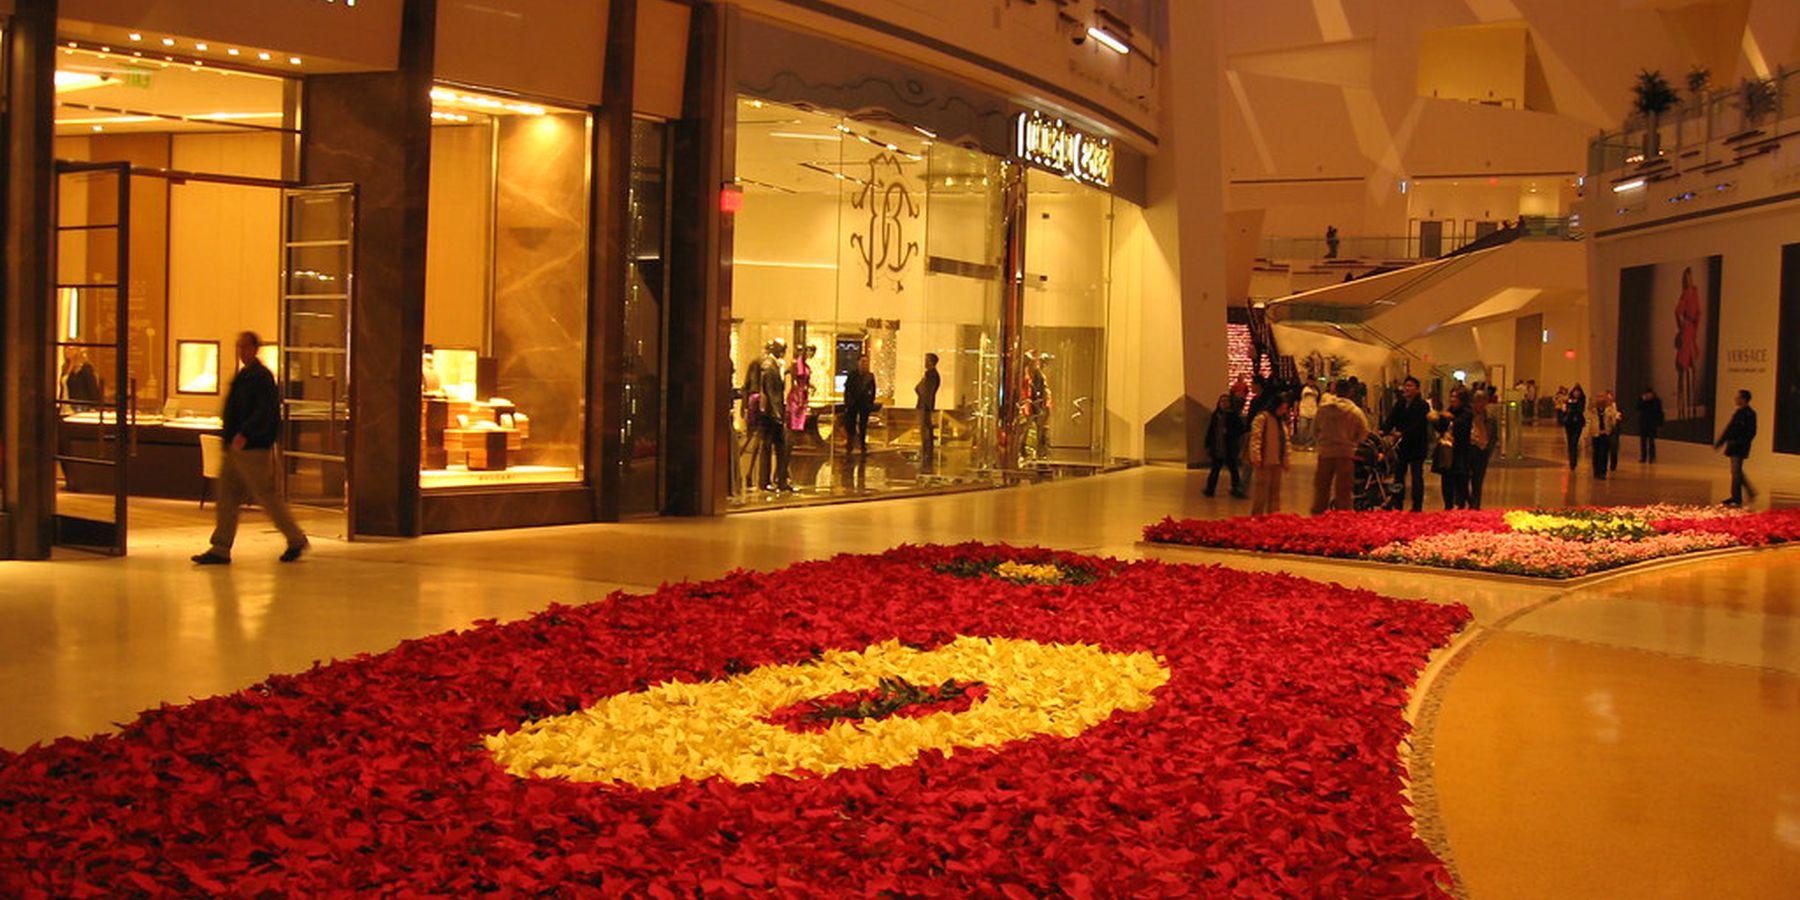 Crystals Hotel - Las Vegas - Nevada - Doets Reizen